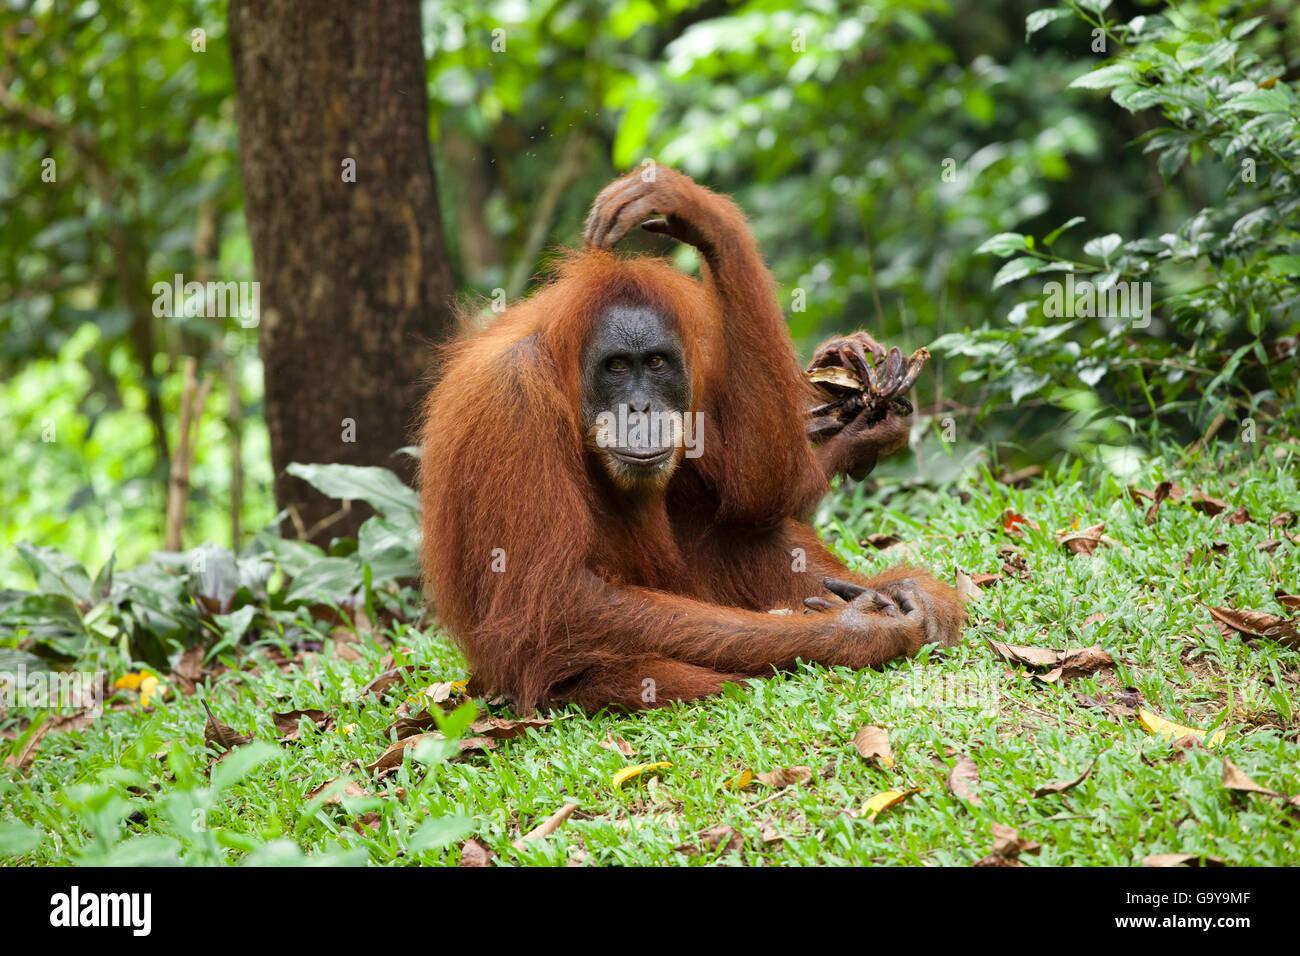 Sumatran orangutan (Pongo abelii) in the rain forests of Sumatra, Indonesia, Asia - Stock Image